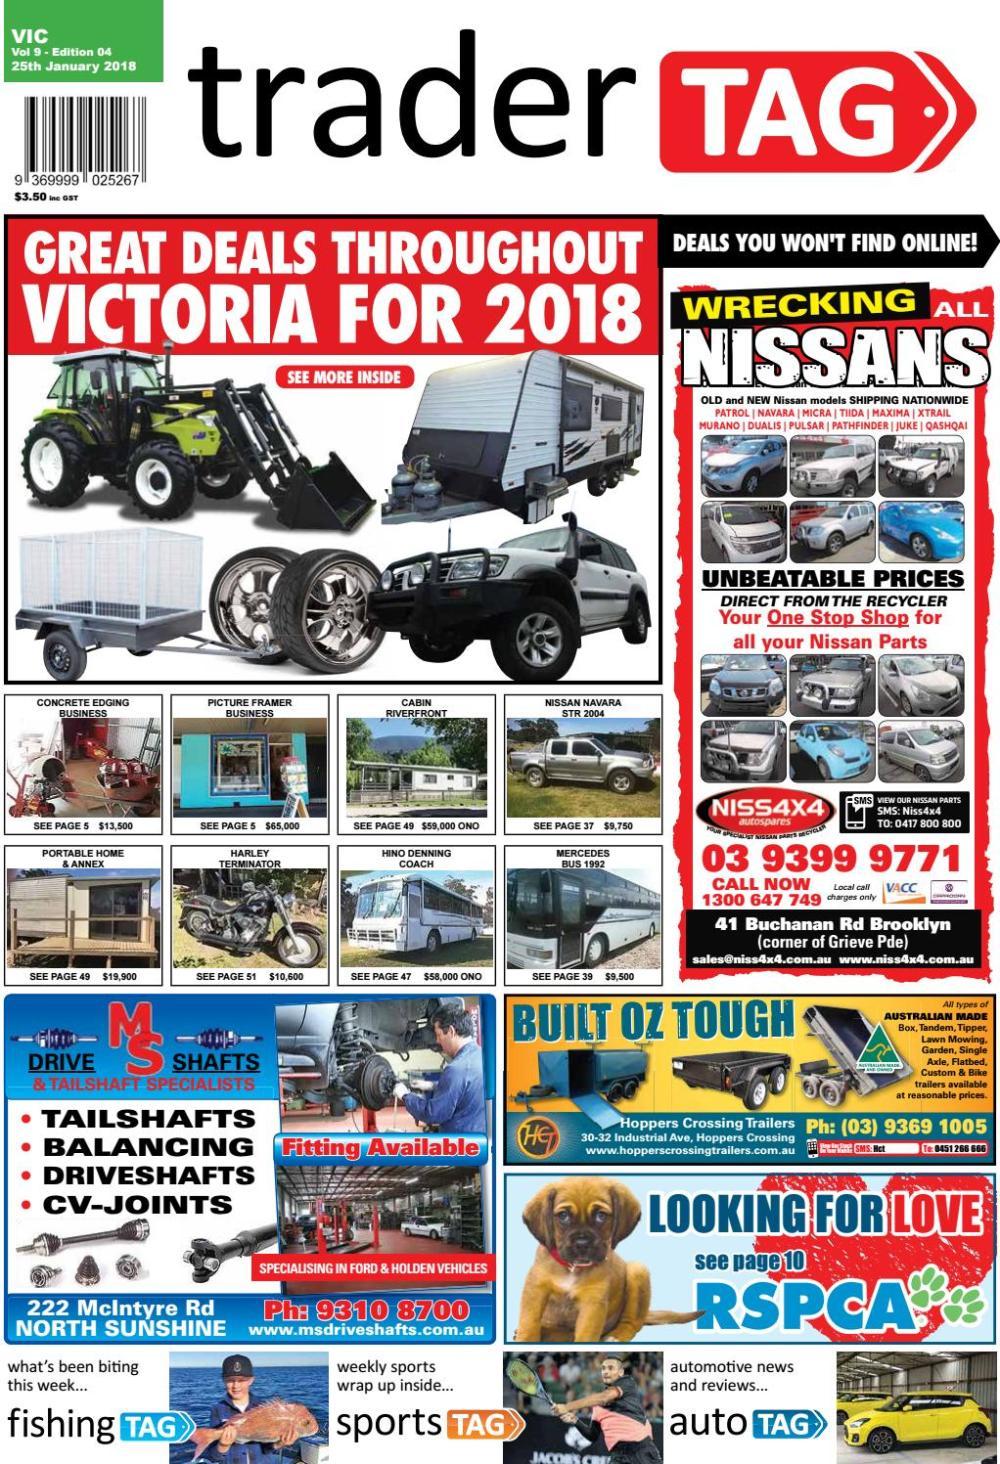 medium resolution of tradertag victoria edition 04 2018 by tradertag design issuu mini chopper wiring harness diagrams kia ceed gt 1966 mustang wiring